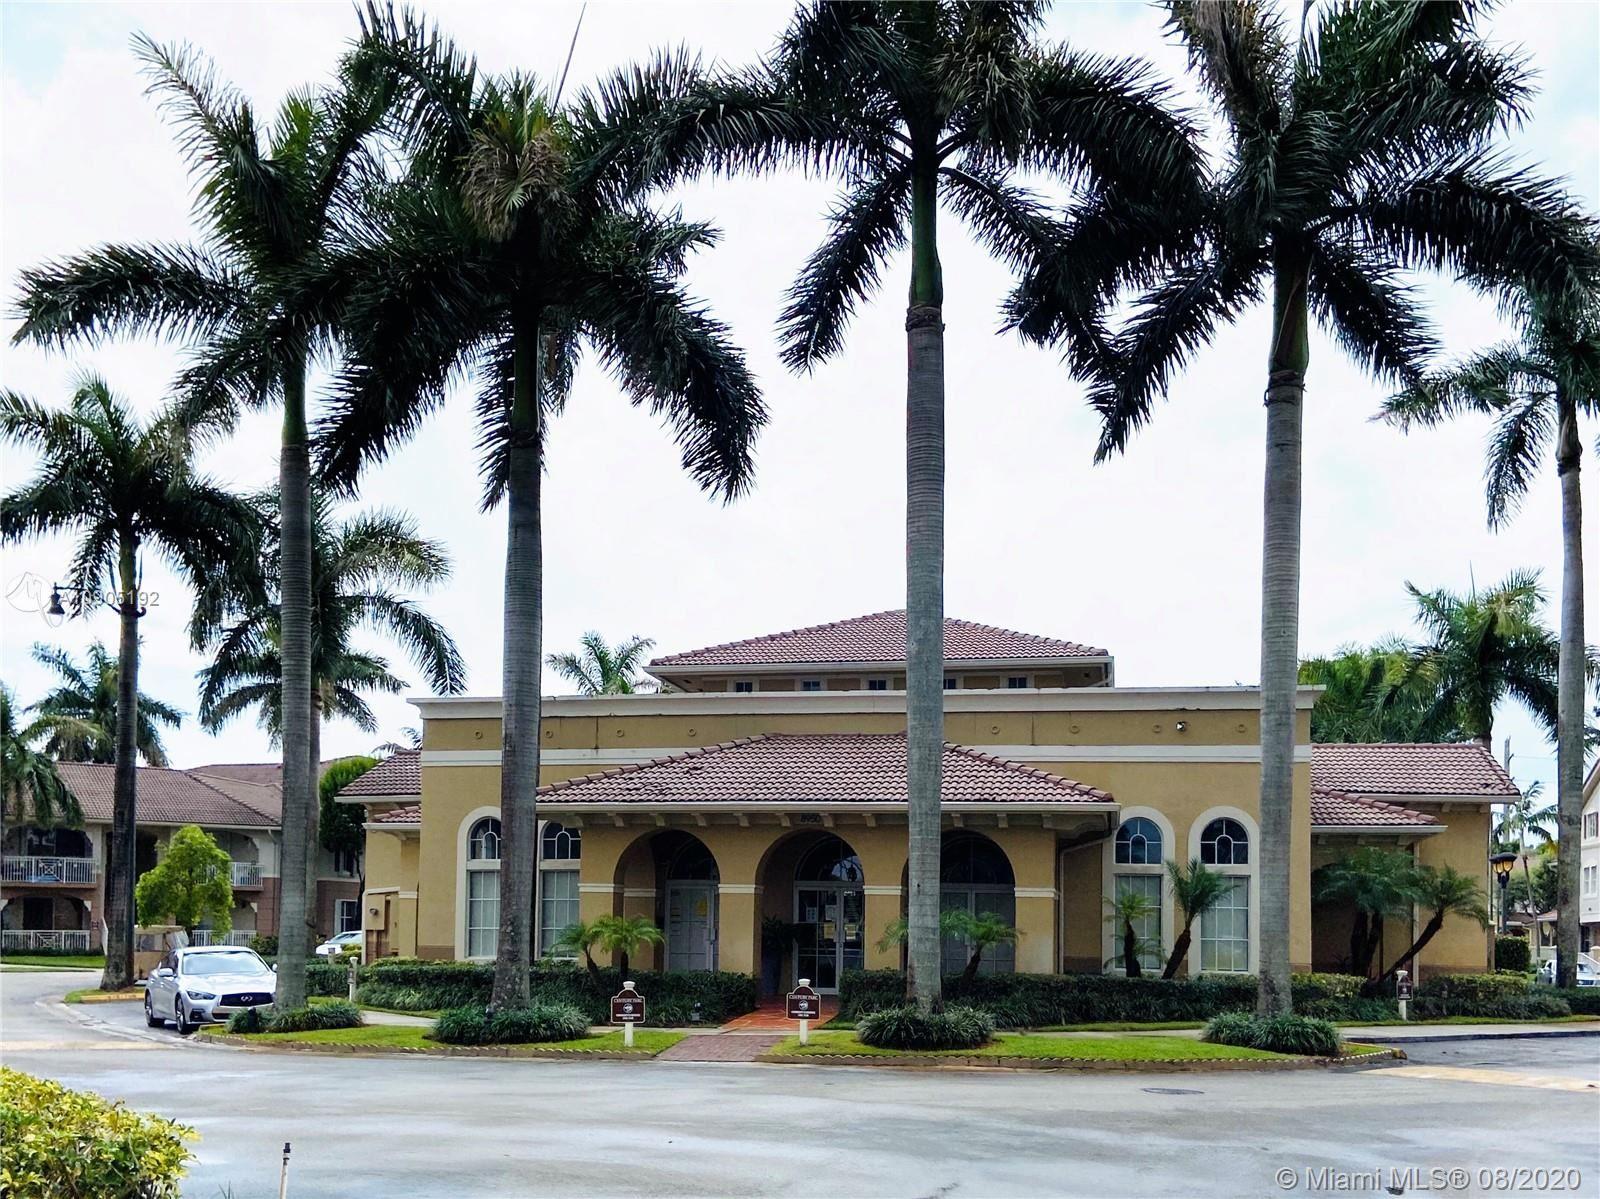 Photo of 8976 W Flagler St #4, Miami, FL 33174 (MLS # A10905192)